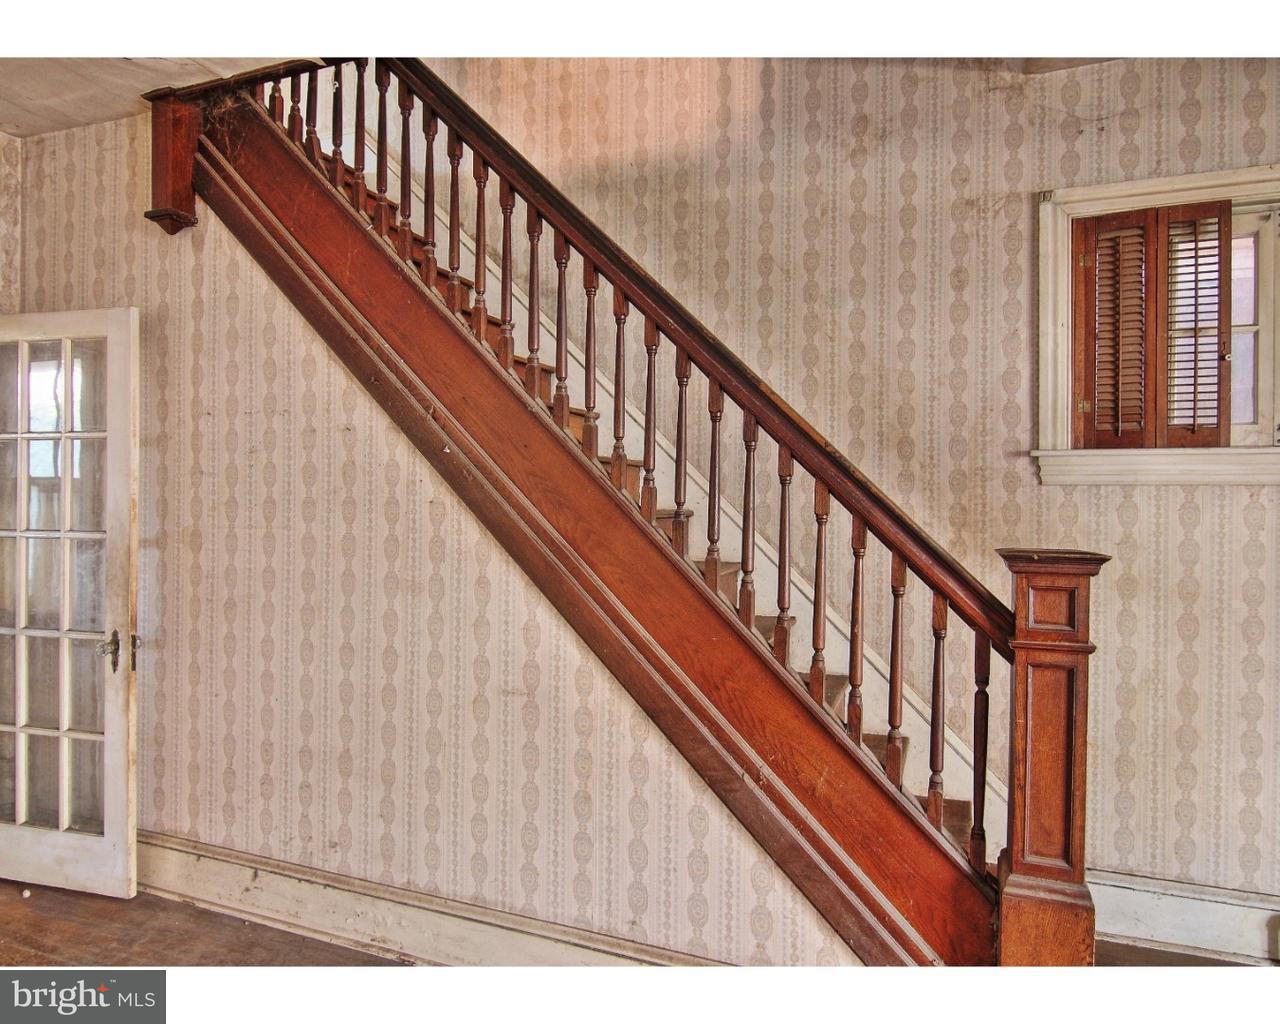 260 BEECH ST, POTTSTOWN - Listed at $55,000, POTTSTOWN